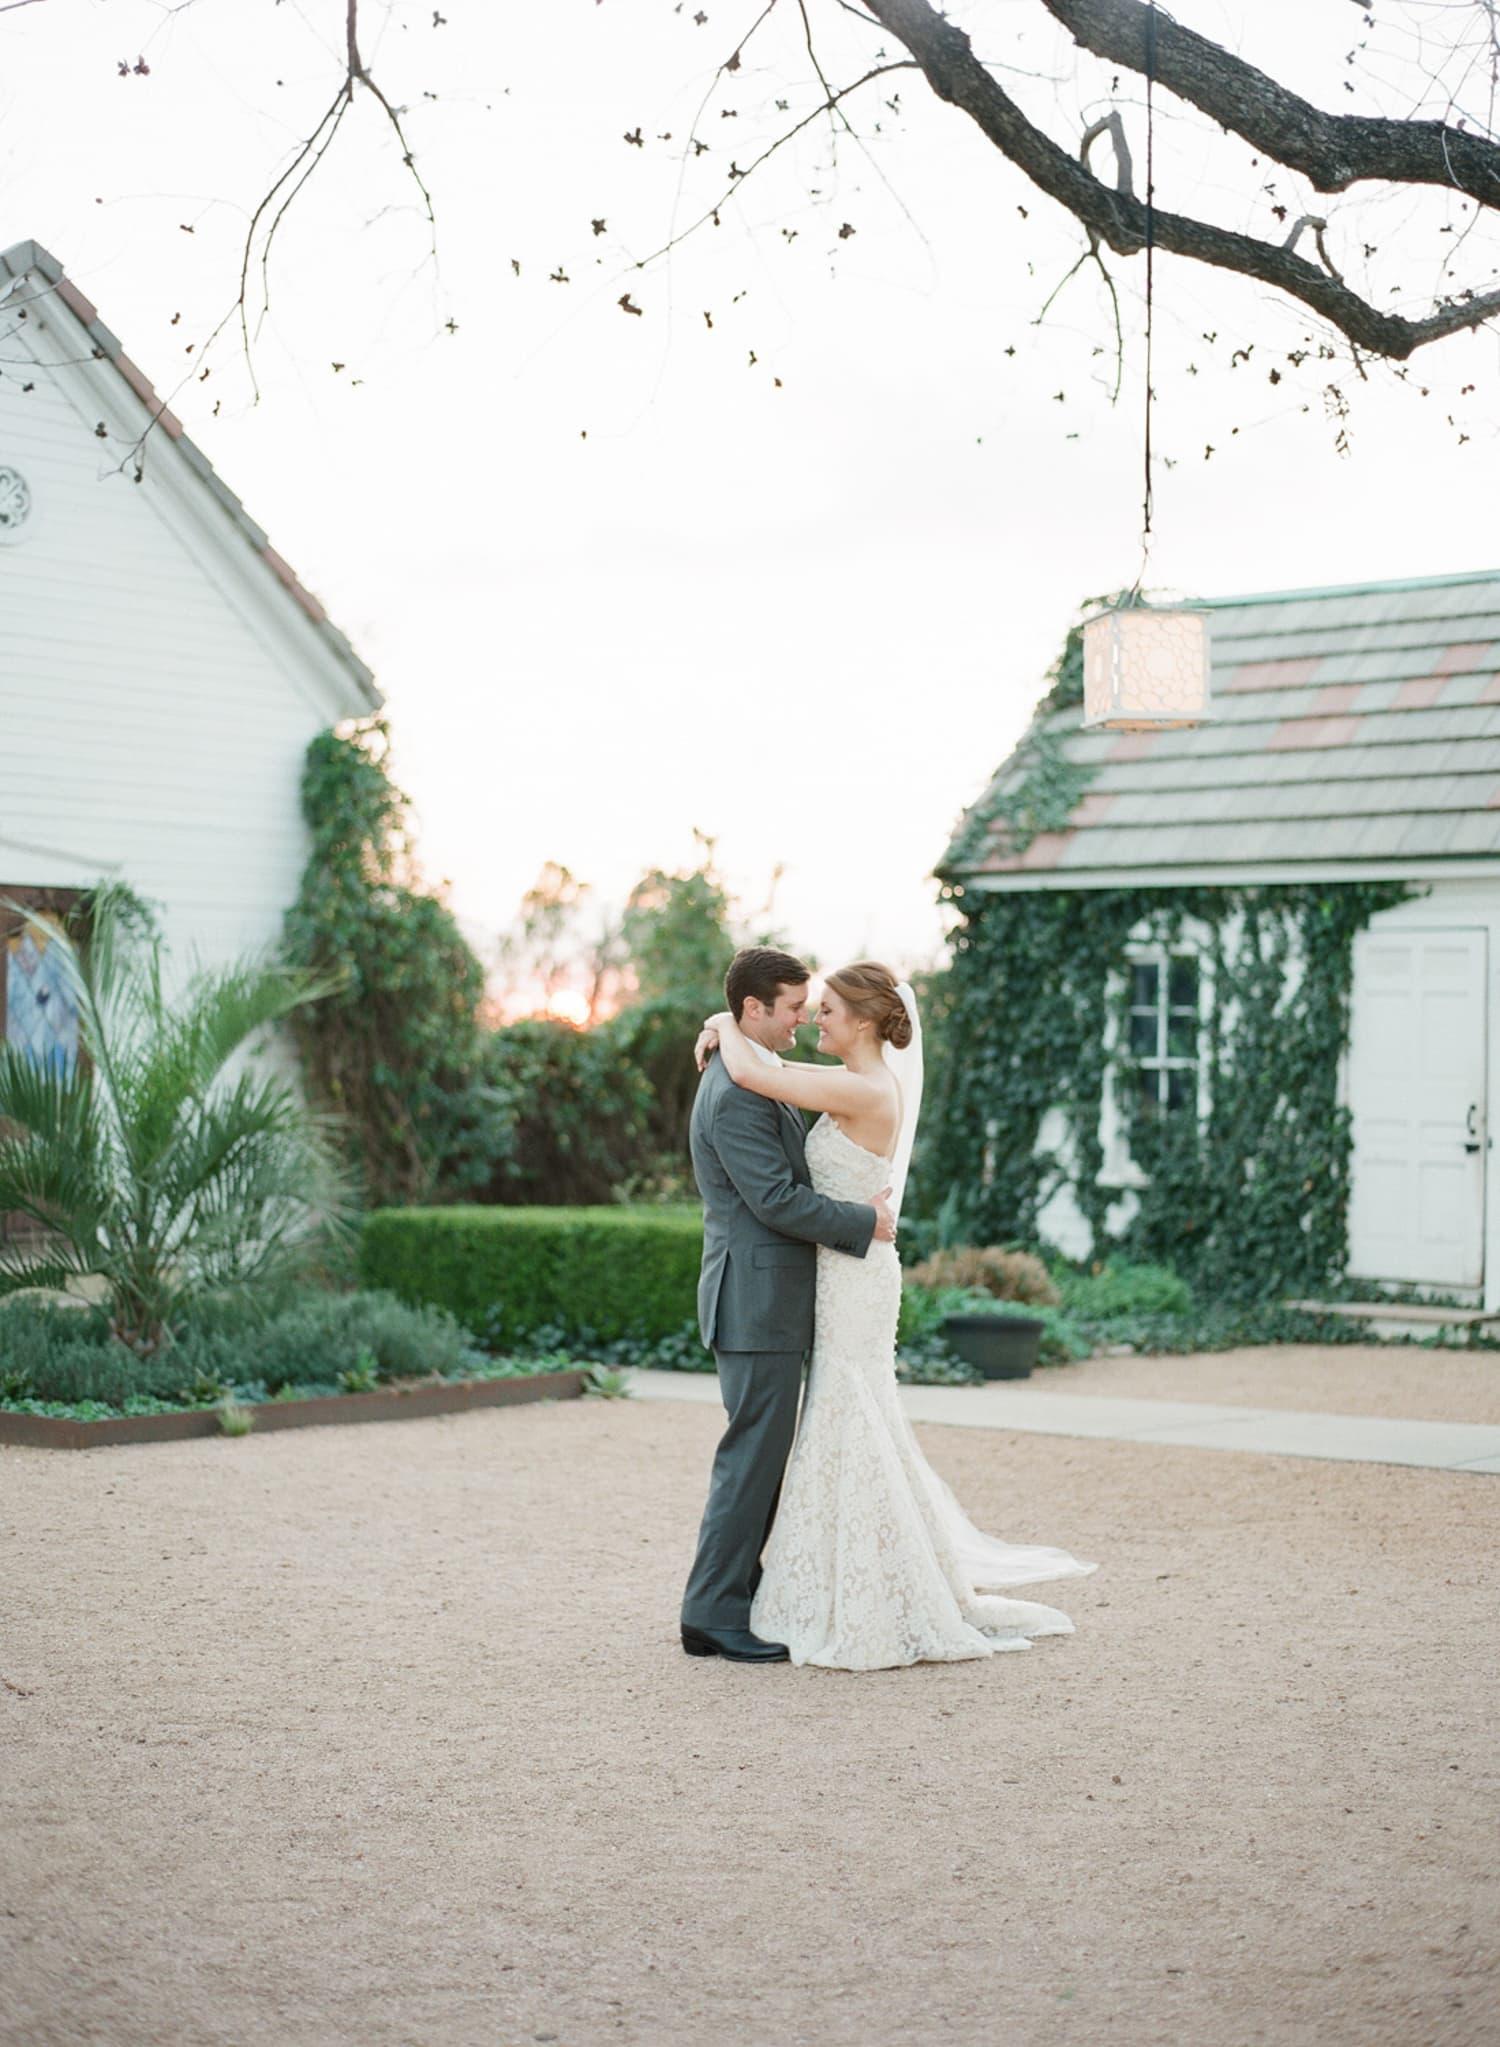 barr-mansion-wedding-37.jpg